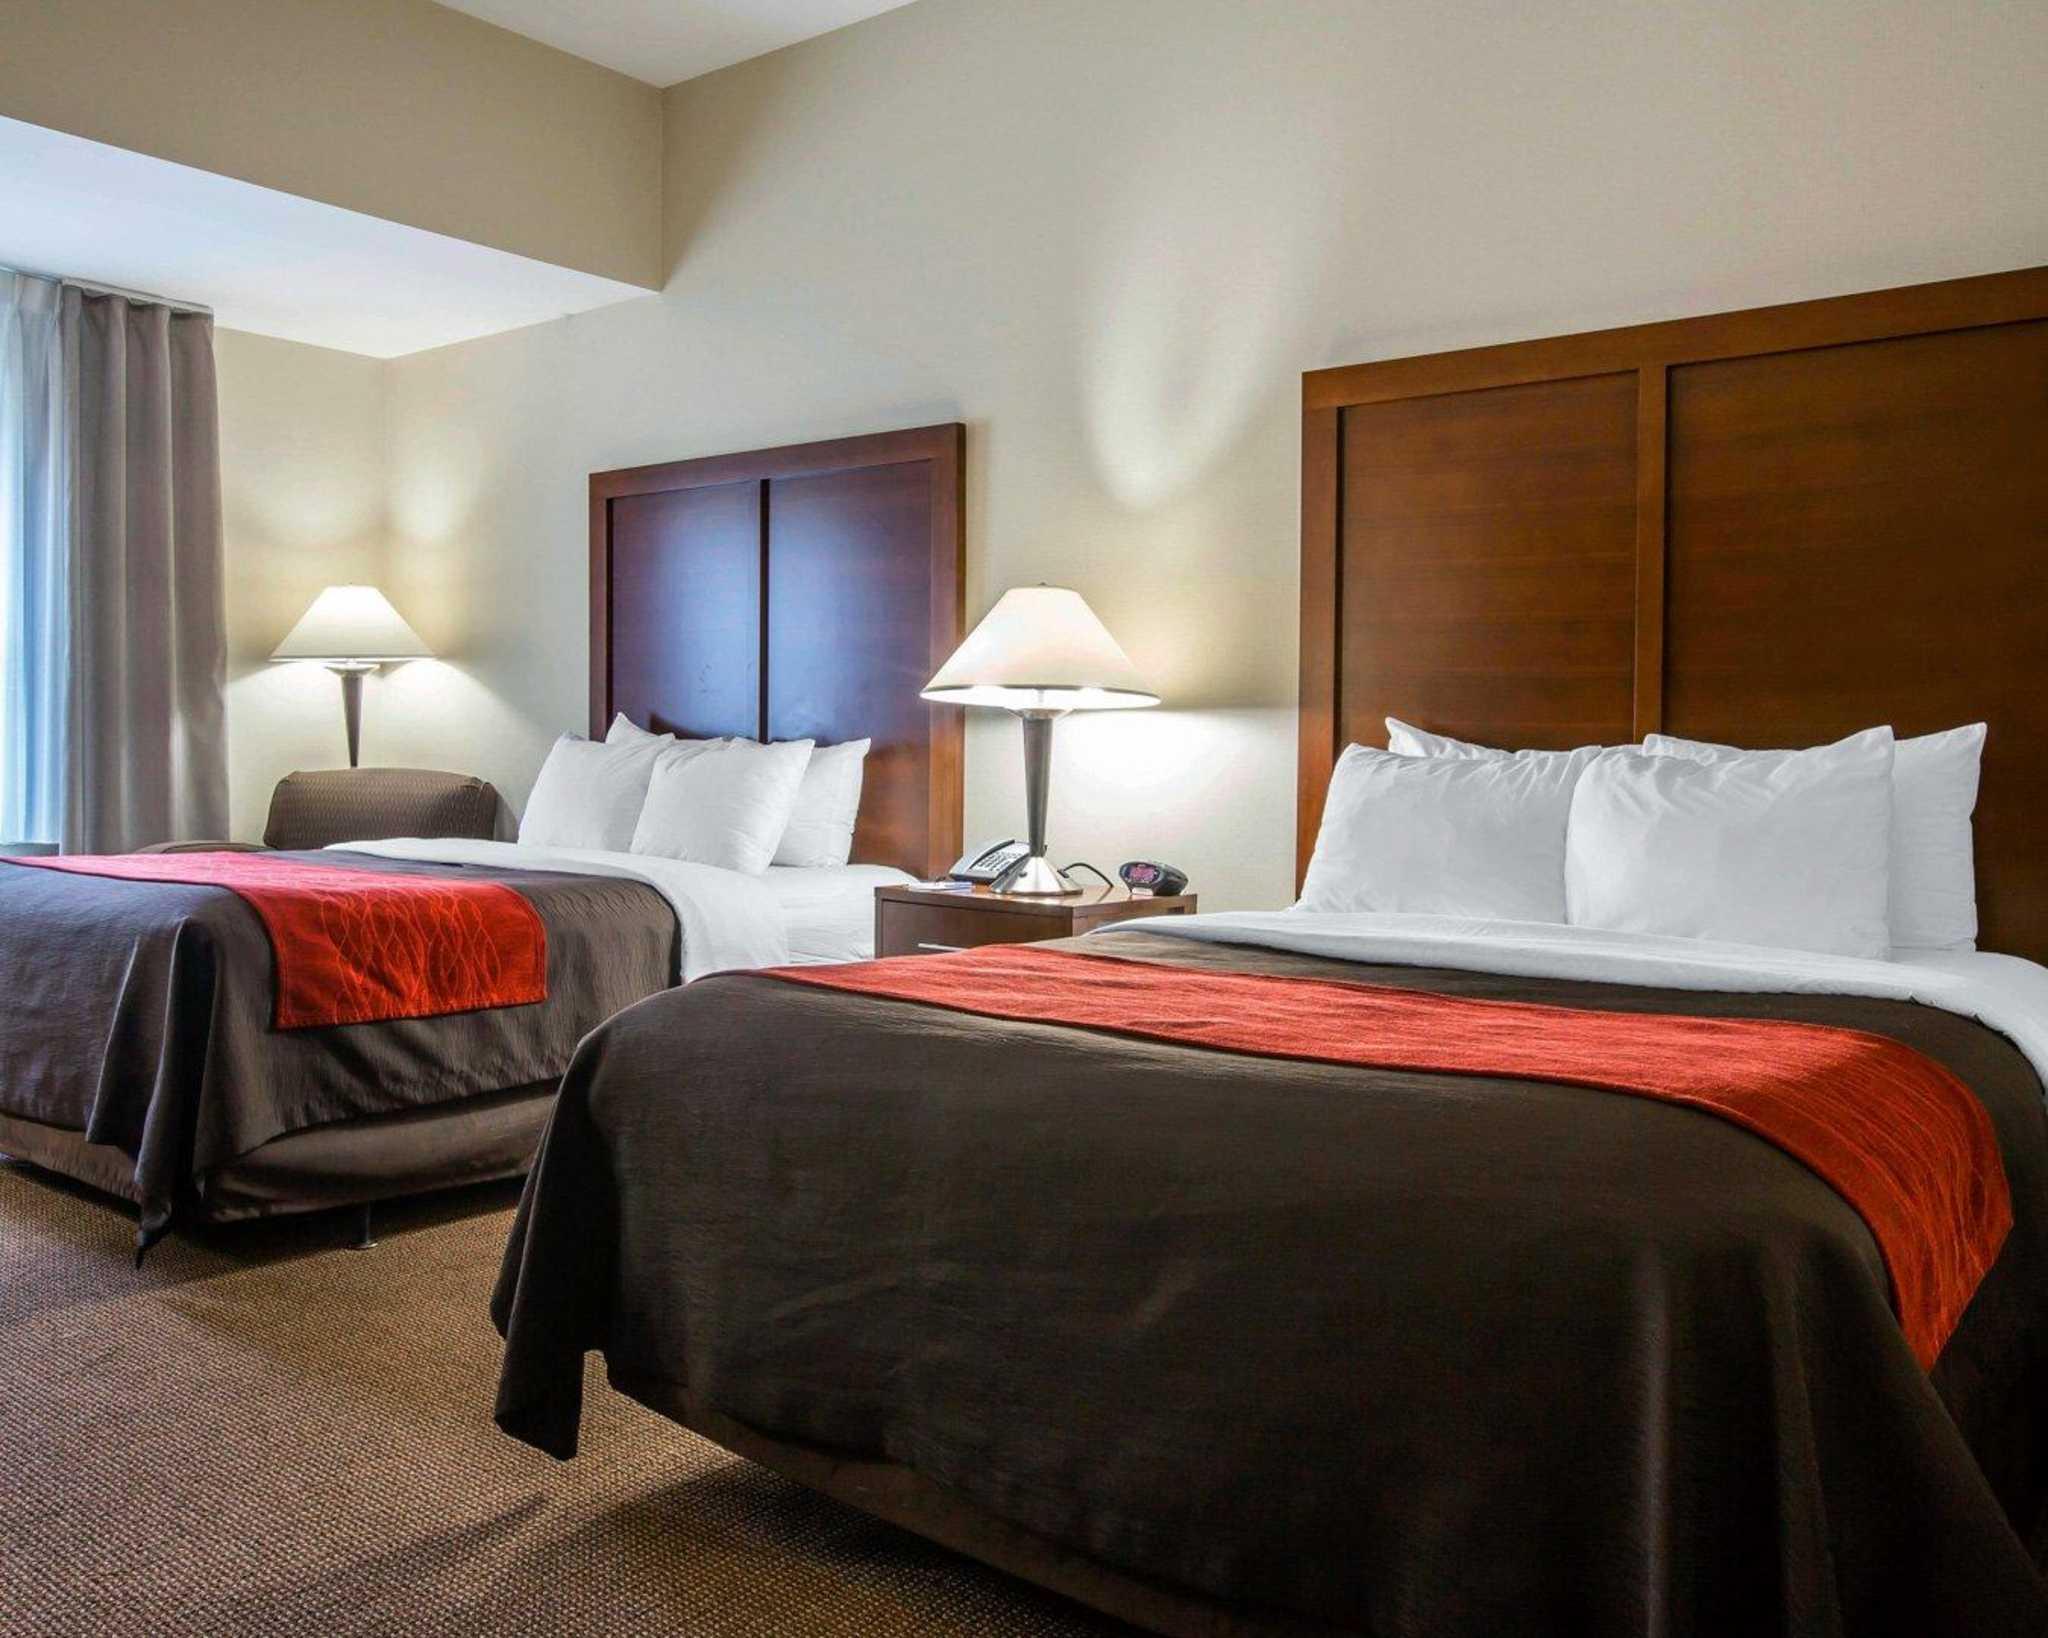 Comfort Inn & Suites adj to Akwesasne Mohawk Casino image 23